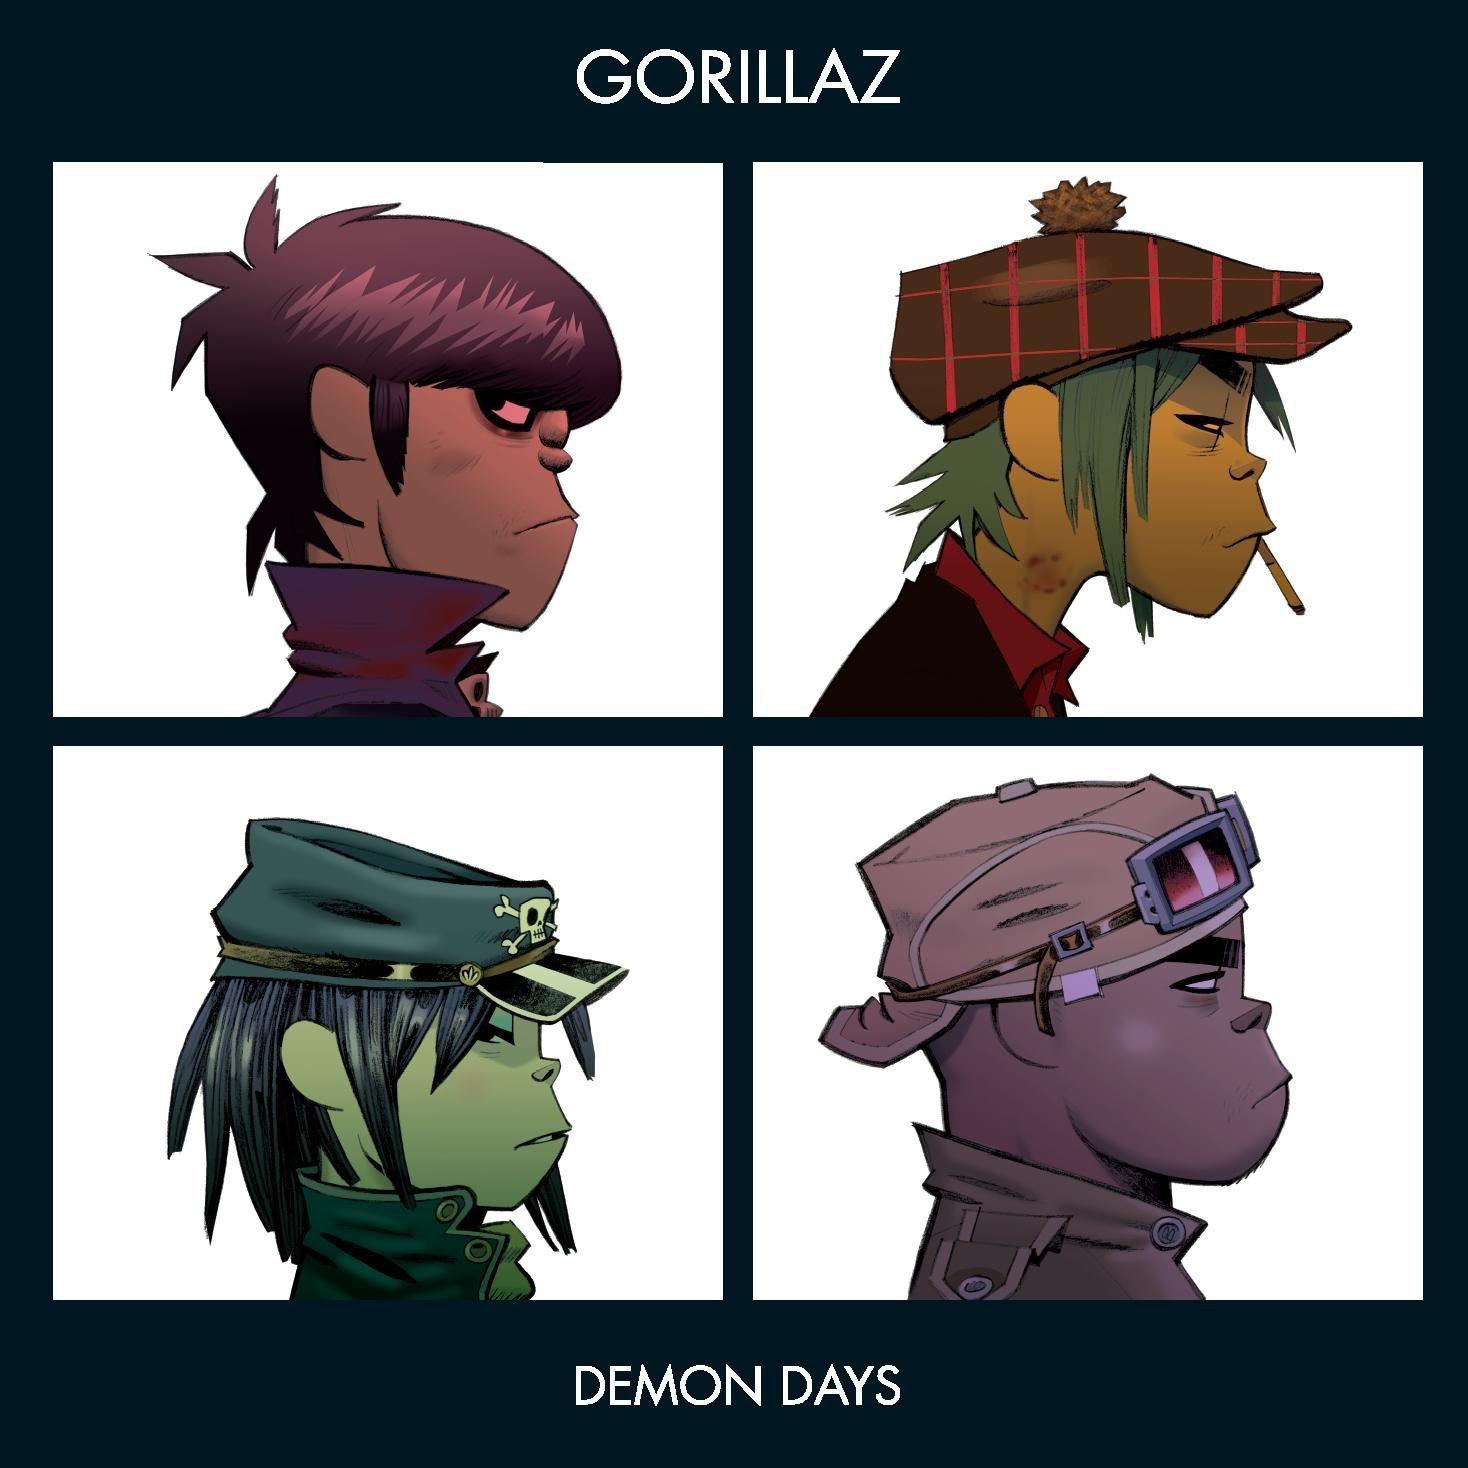 Murdoc Gorillaz Demon Days Demon Days by Gorillaz...